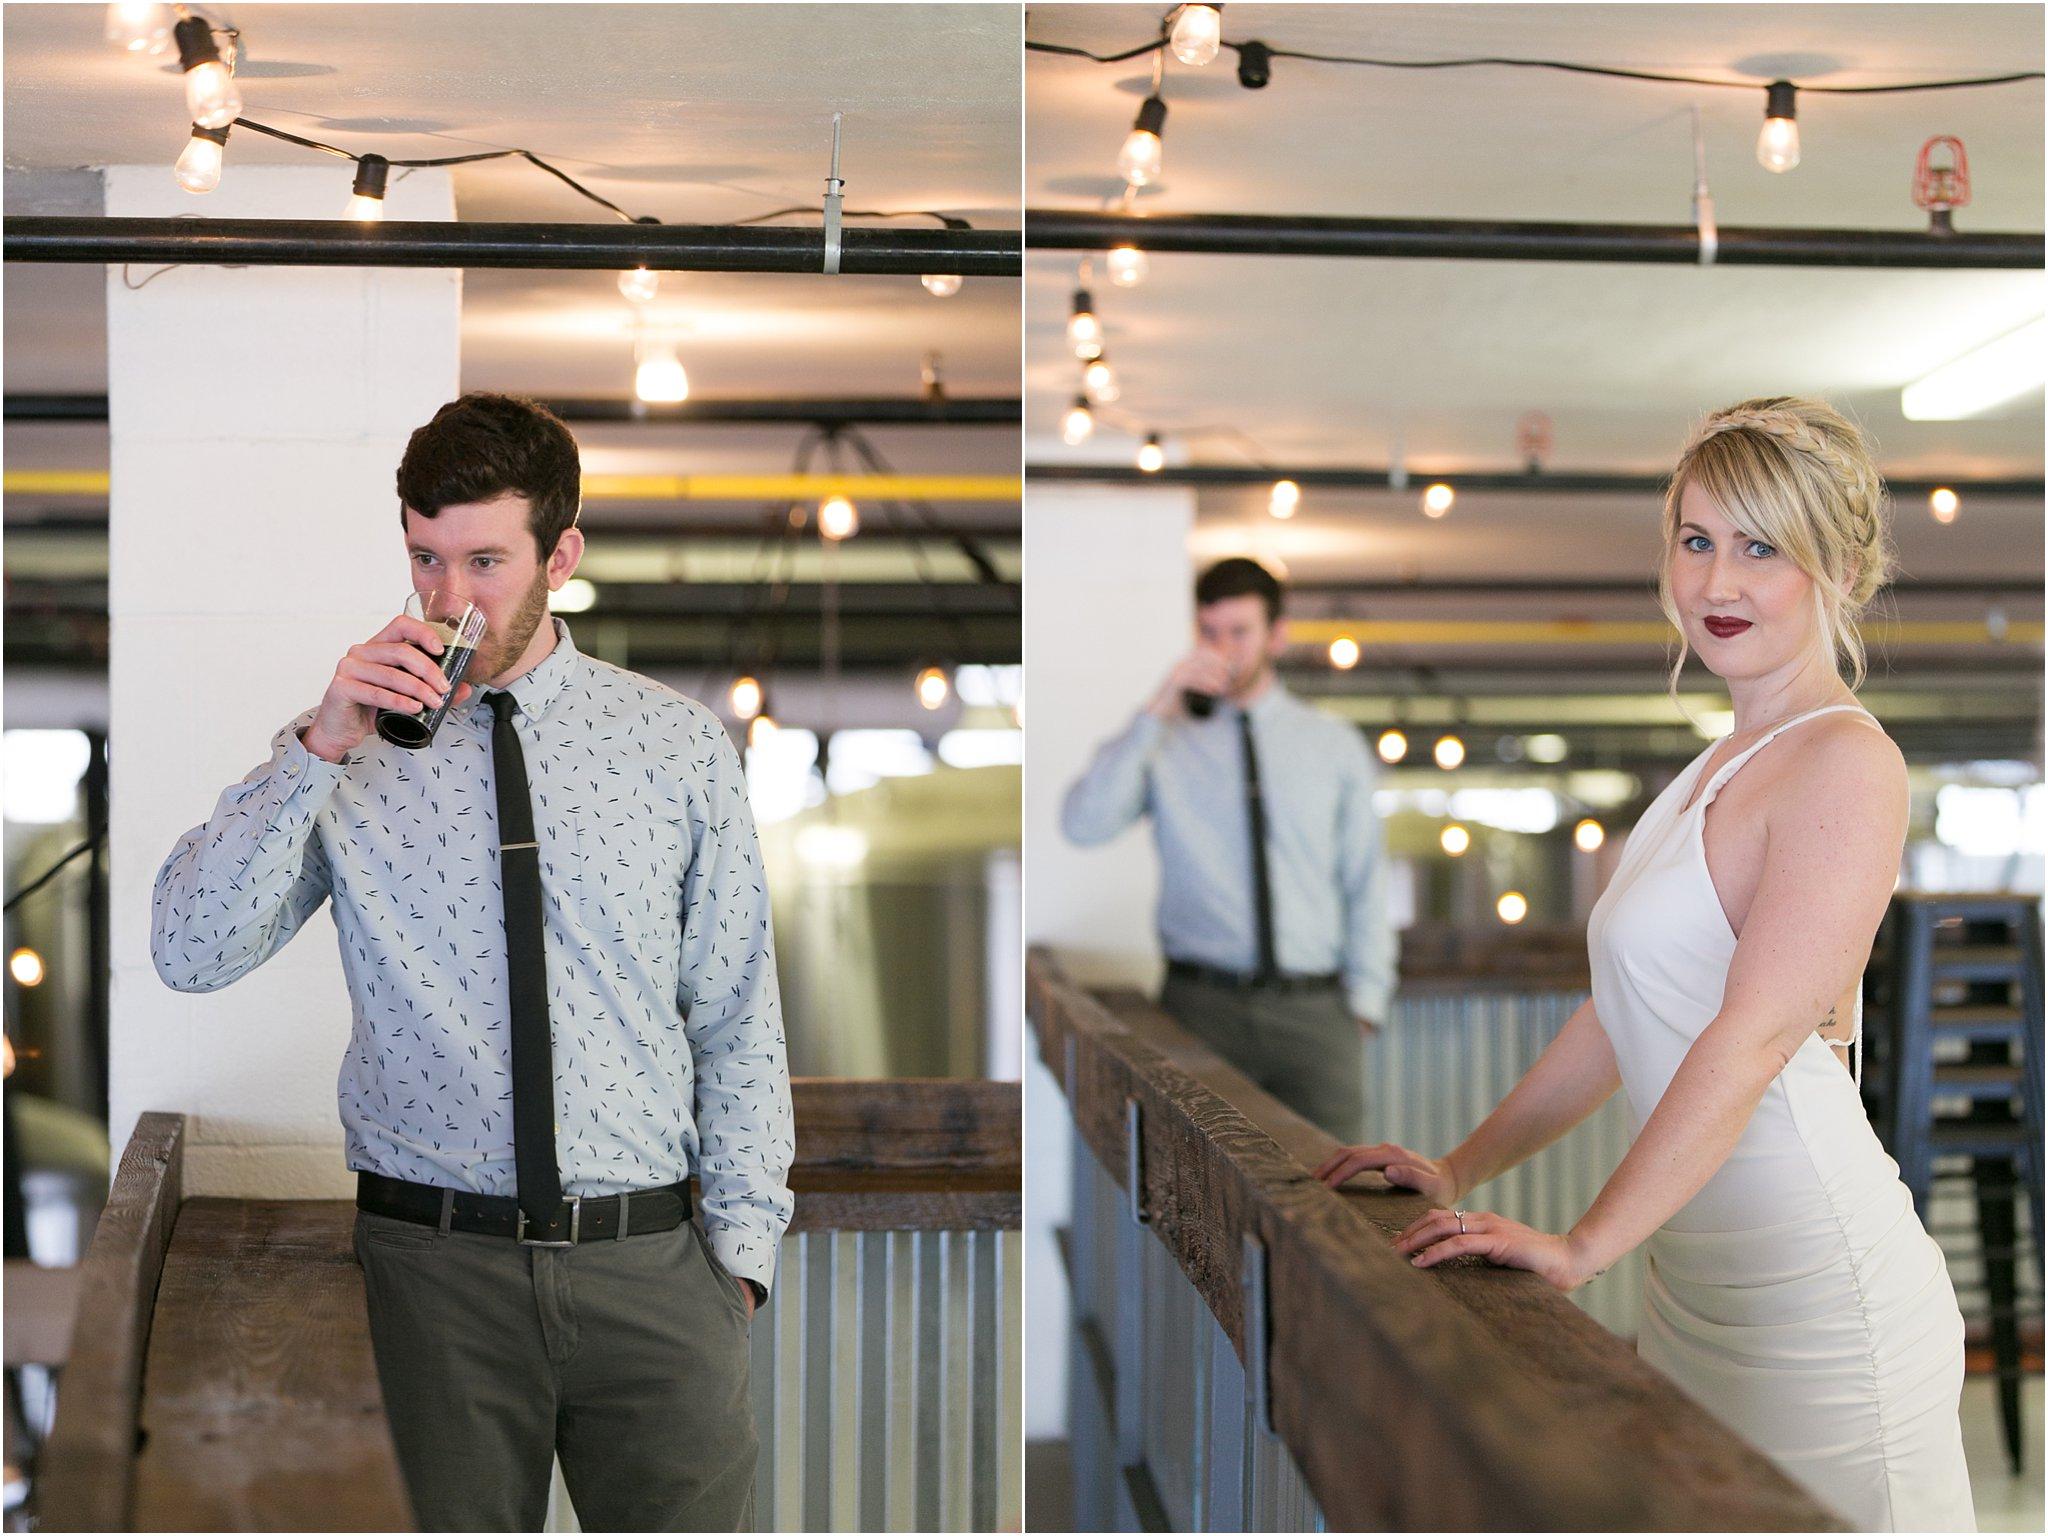 jessica_ryan_photography_oconnor_brewing_wedding_oconnor_brewing_co_norfolk_virginia_roost_flowers_blue_birds_garage__0810